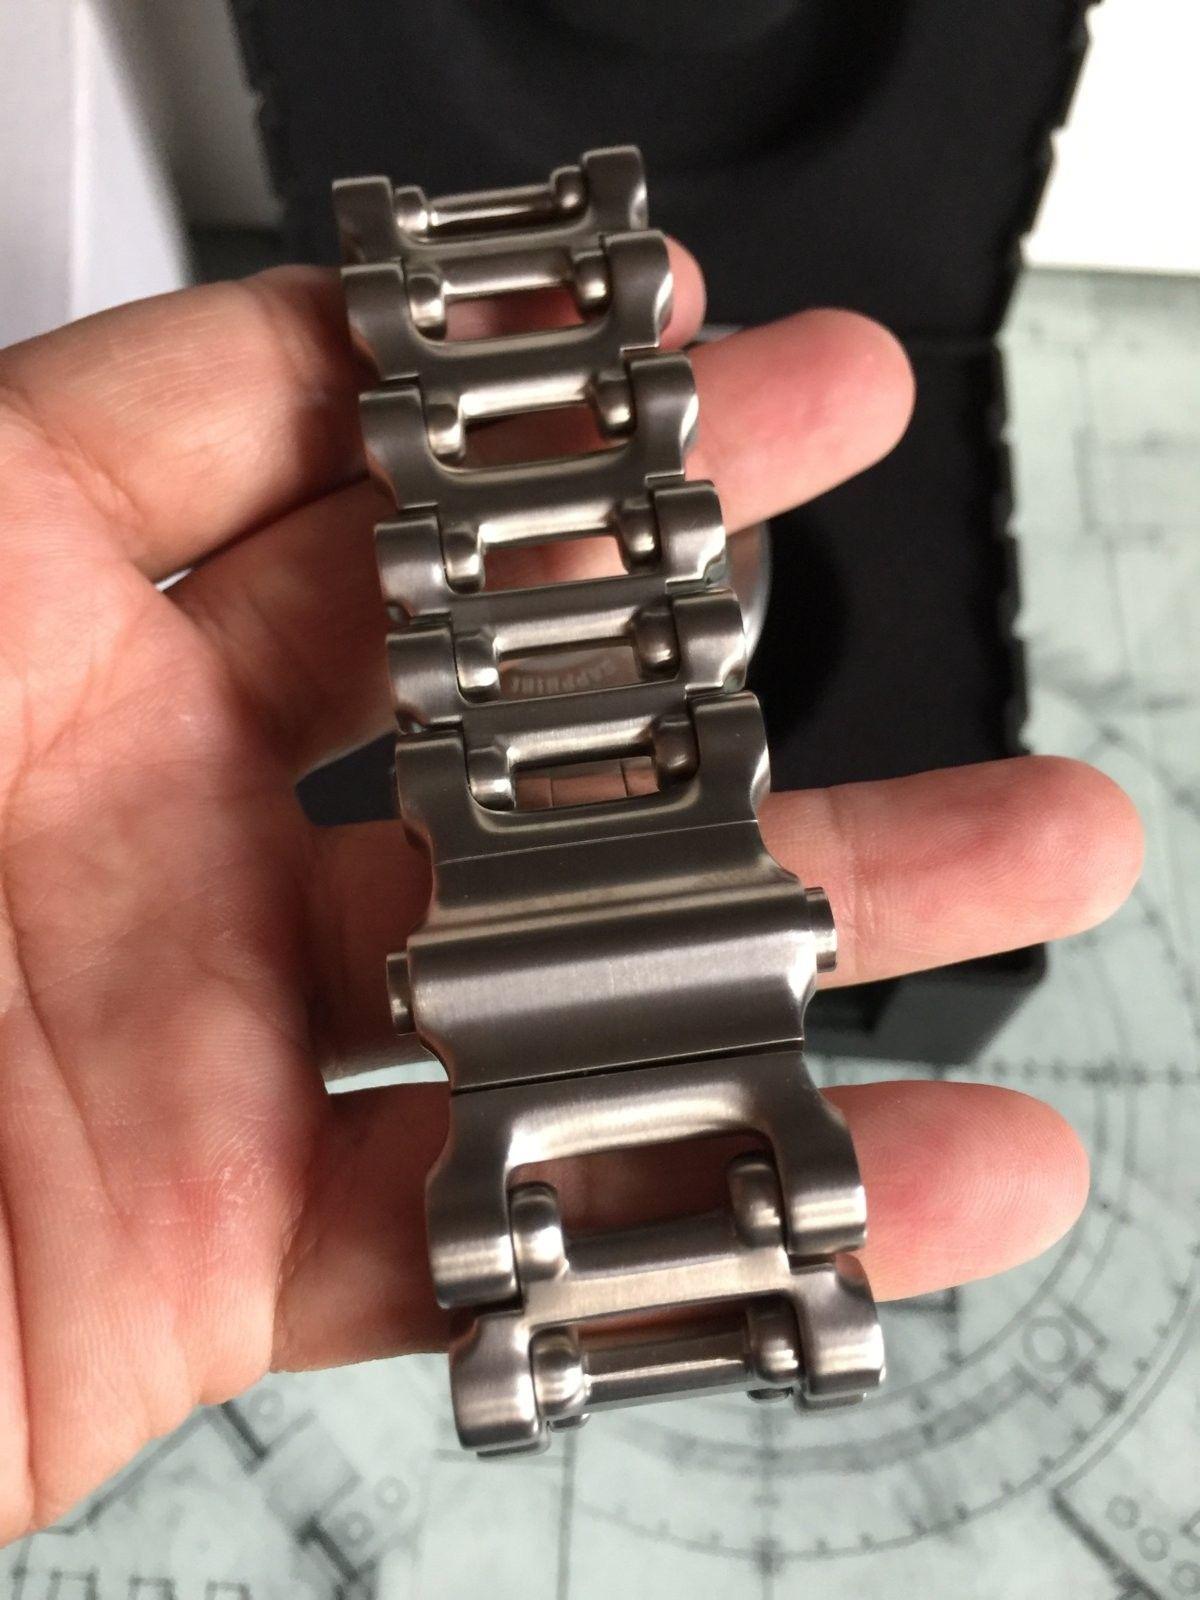 LNIB Black Dial Hollow Point watch - IMG_6065.JPG